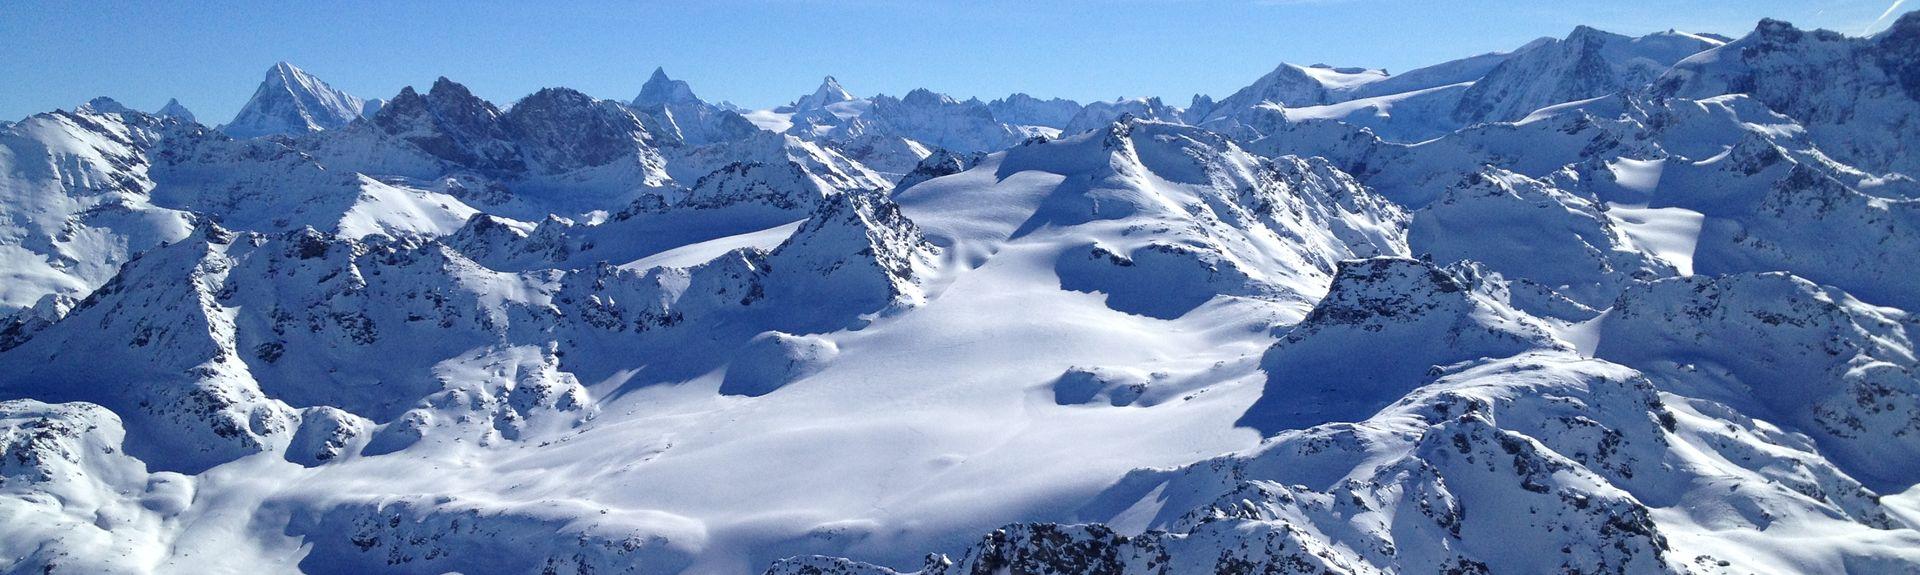 Les Crets Ski Lift, Anniviers, Valais, Switzerland